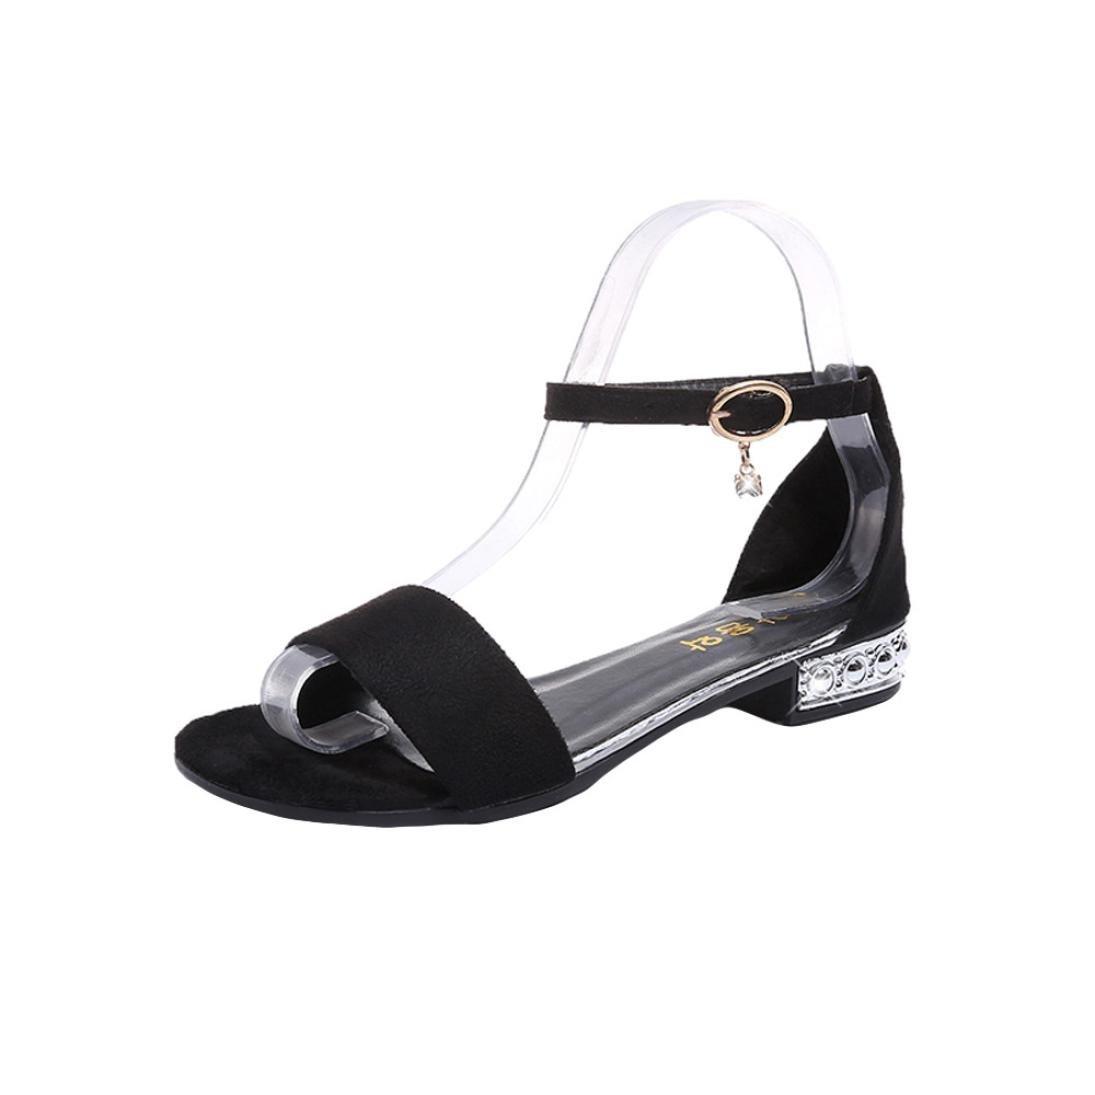 Sandales Femmes, Noir Yesmile Chaussures Femmes Chaussures à Bout Ouvert Ouvert Chaussures Gladiateur Chaussures Flops Sandales Loisirs Noir 6a719c4 - reprogrammed.space